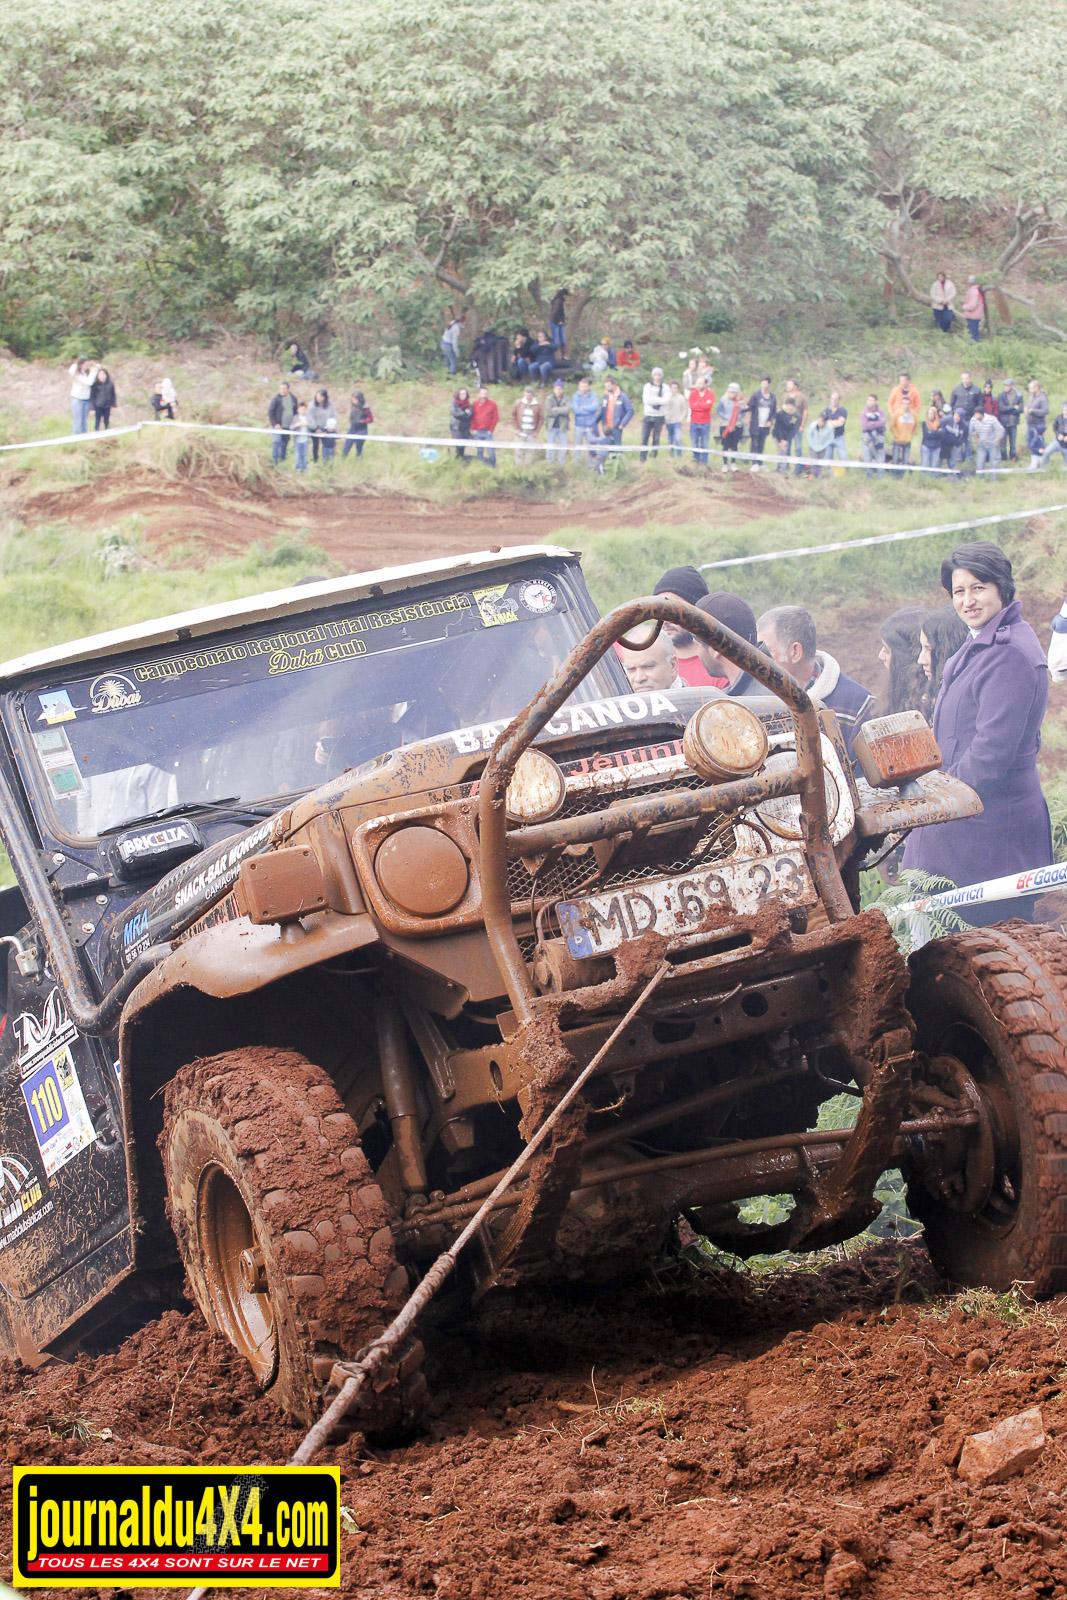 Auto Jeitinho B - 4th place 'Promoção' Class